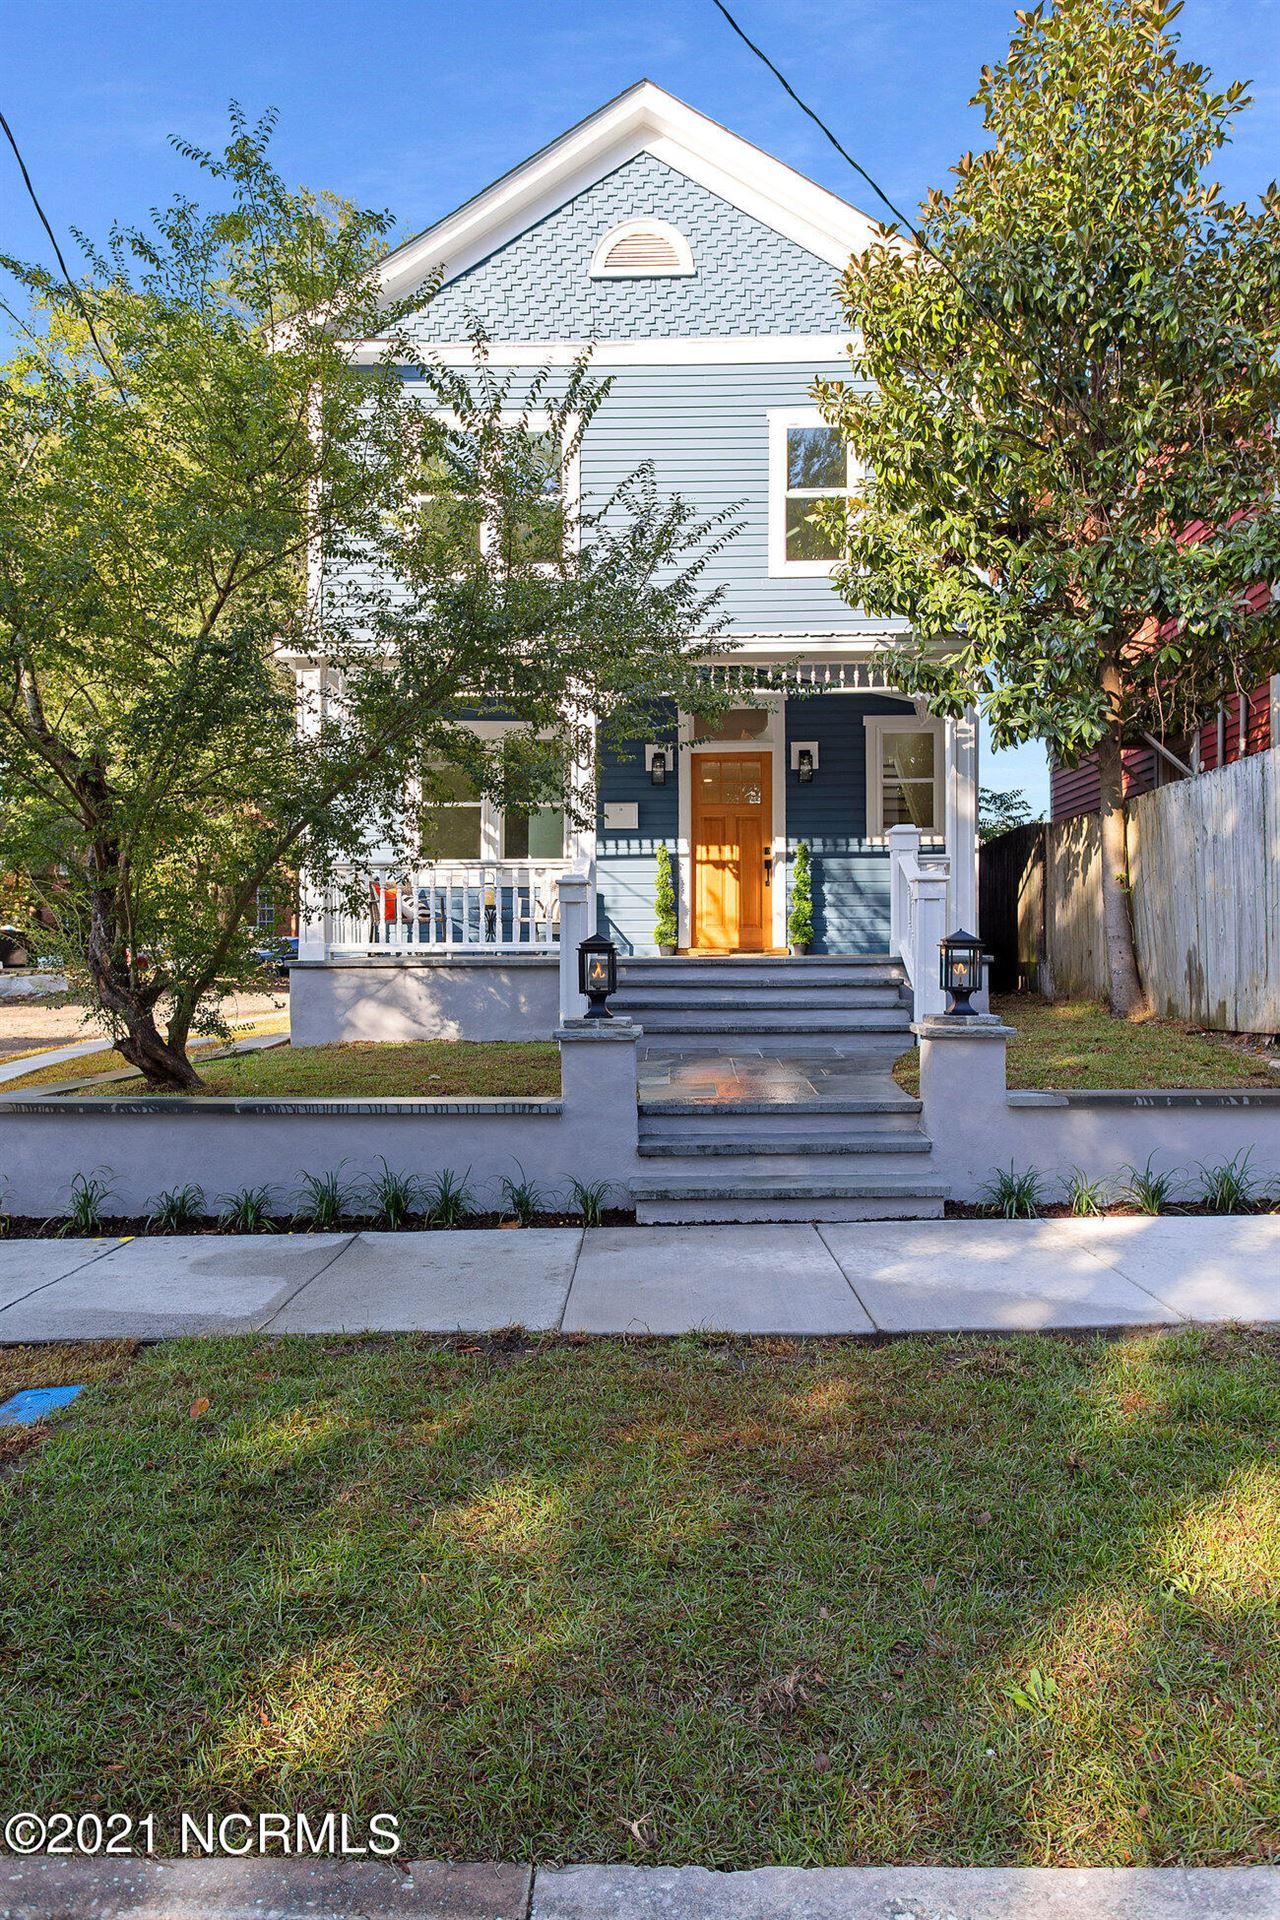 Photo of 406 S 6th Street, Wilmington, NC 28401 (MLS # 100294646)